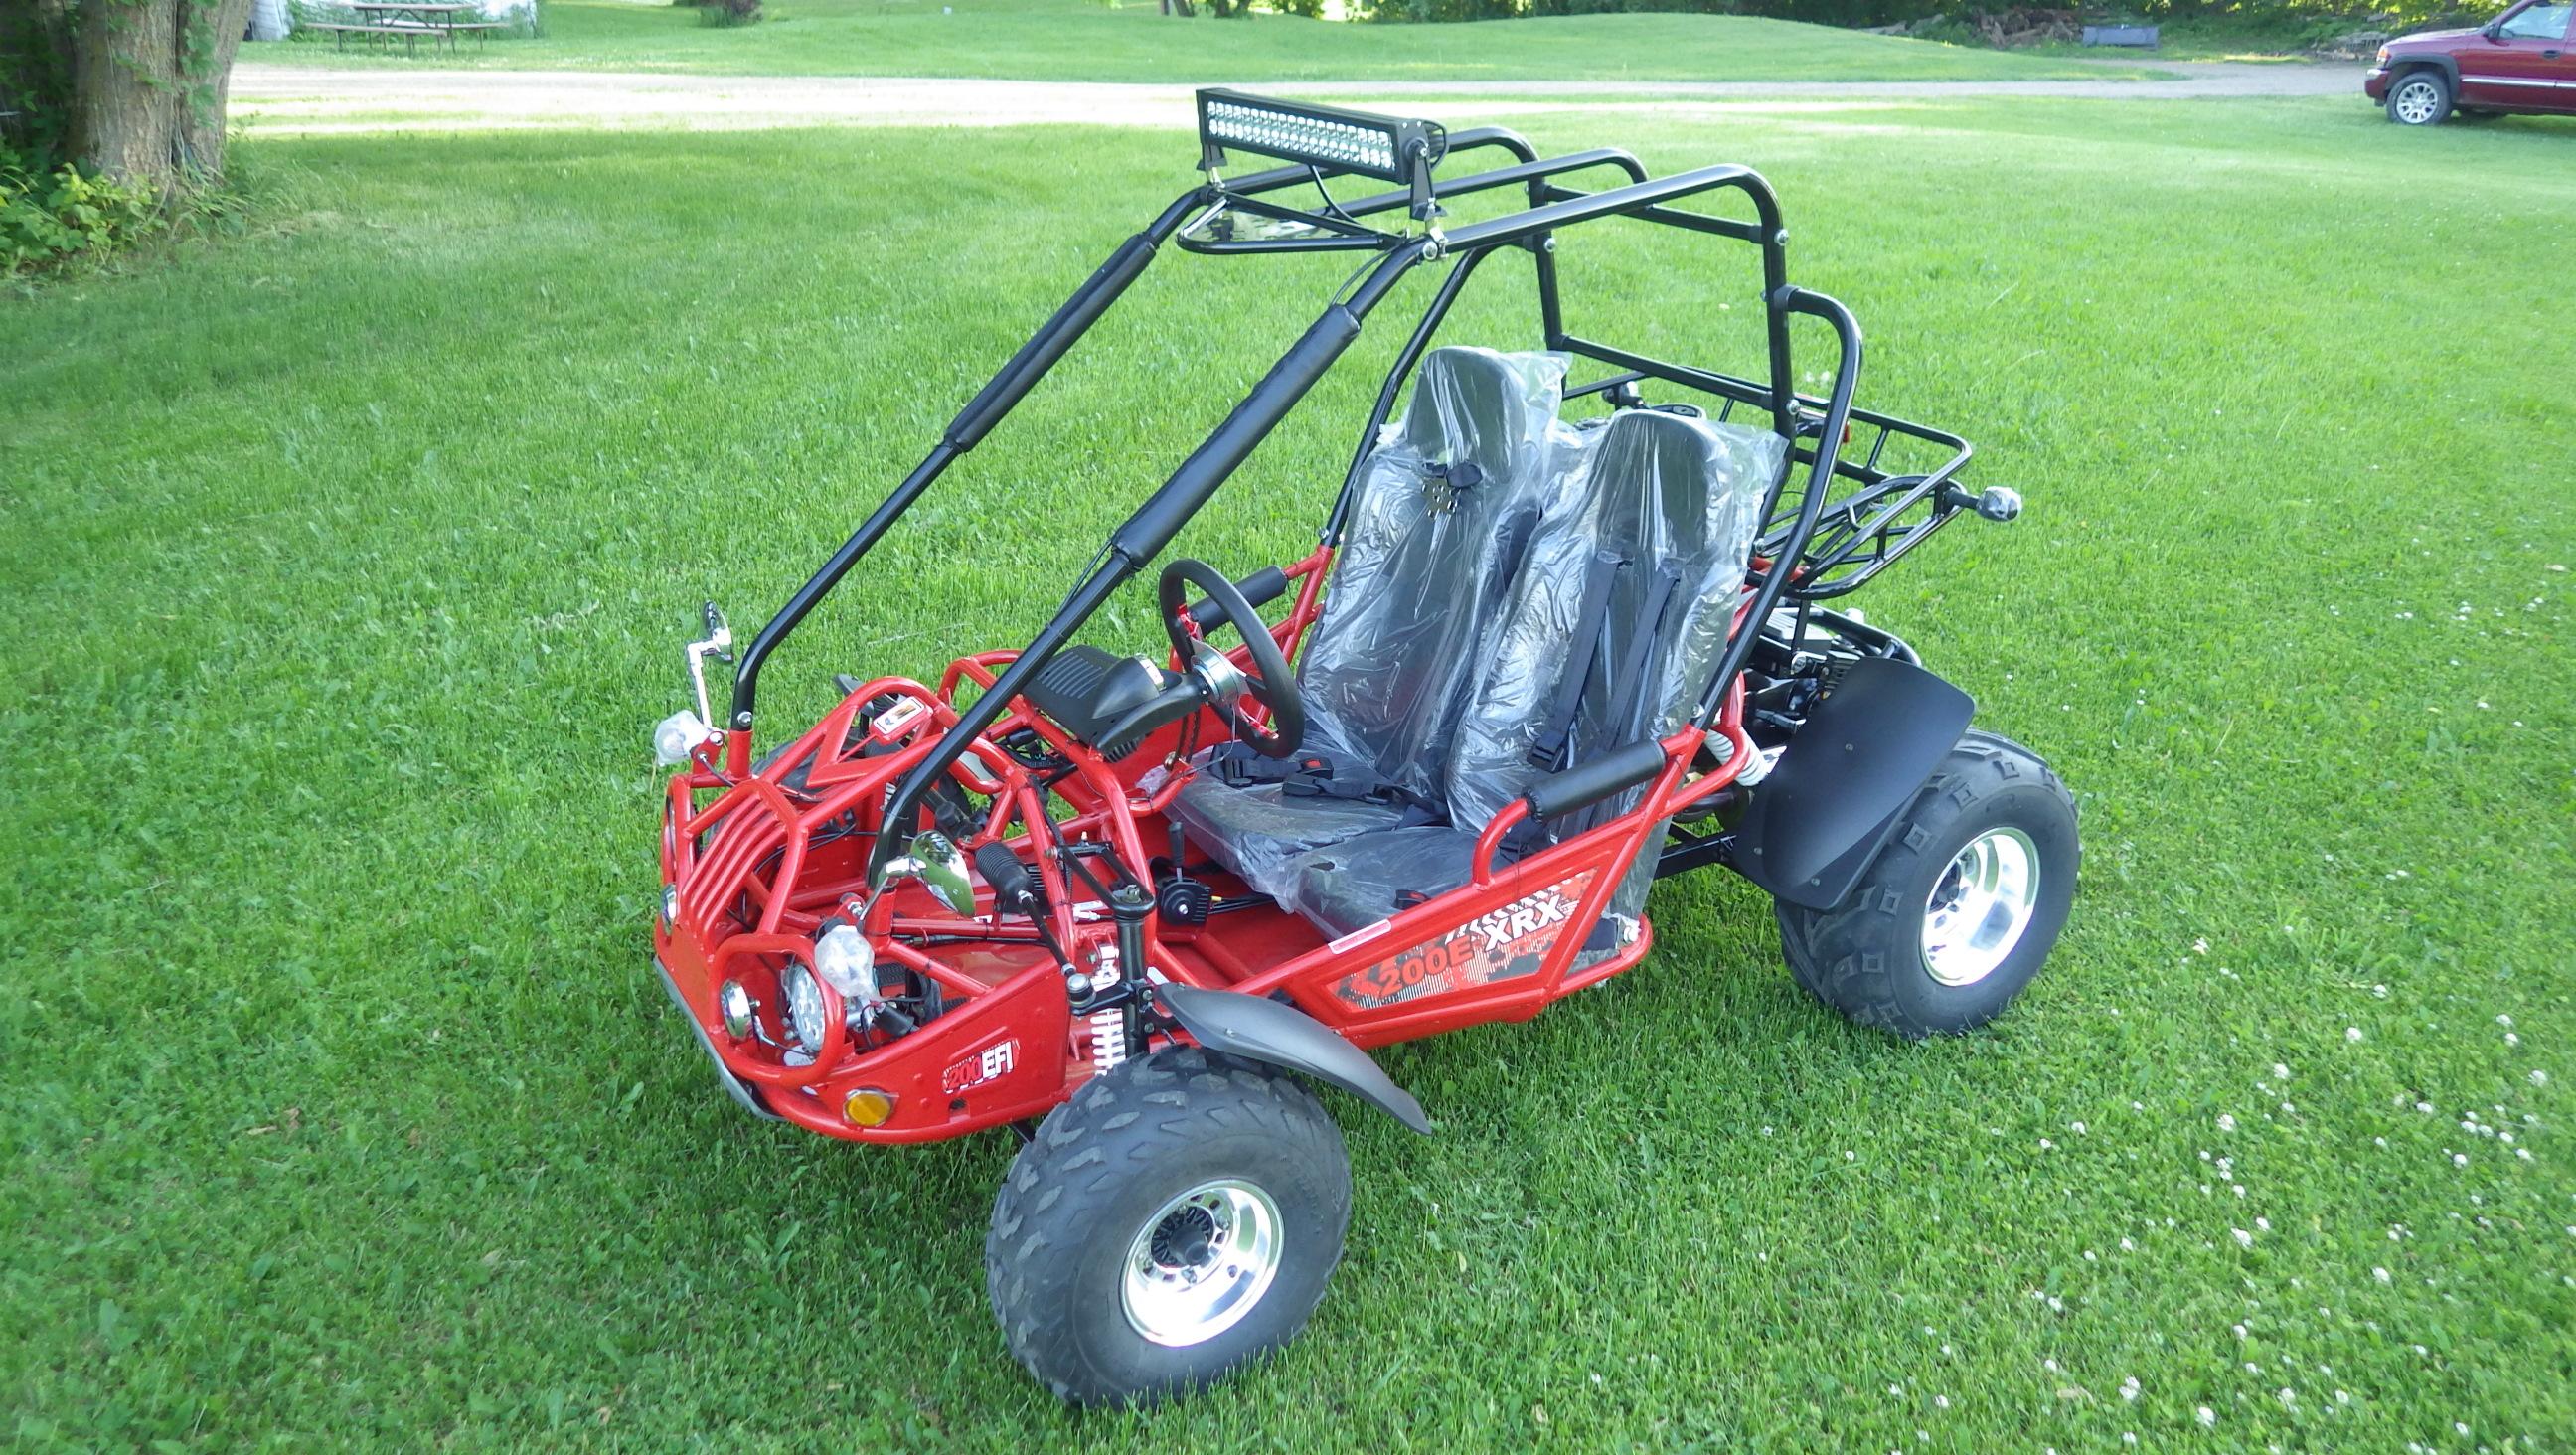 TrailMaster 200 E-XRX Red 9